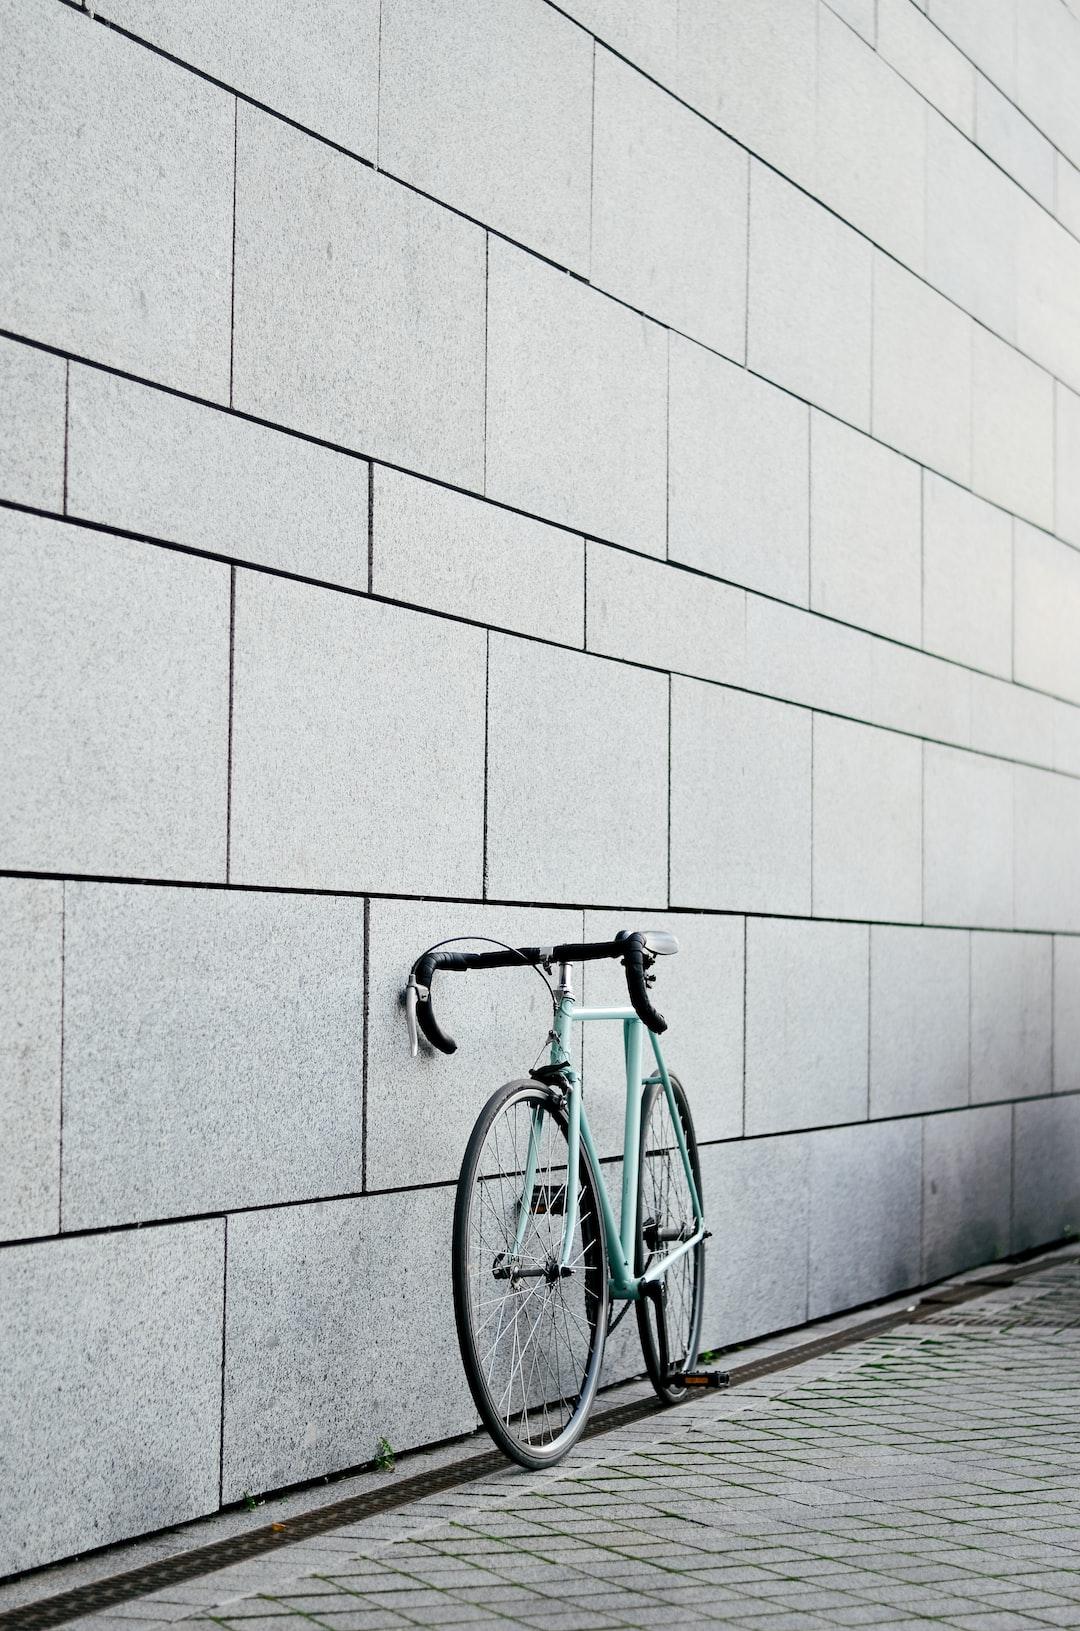 Old fix bike